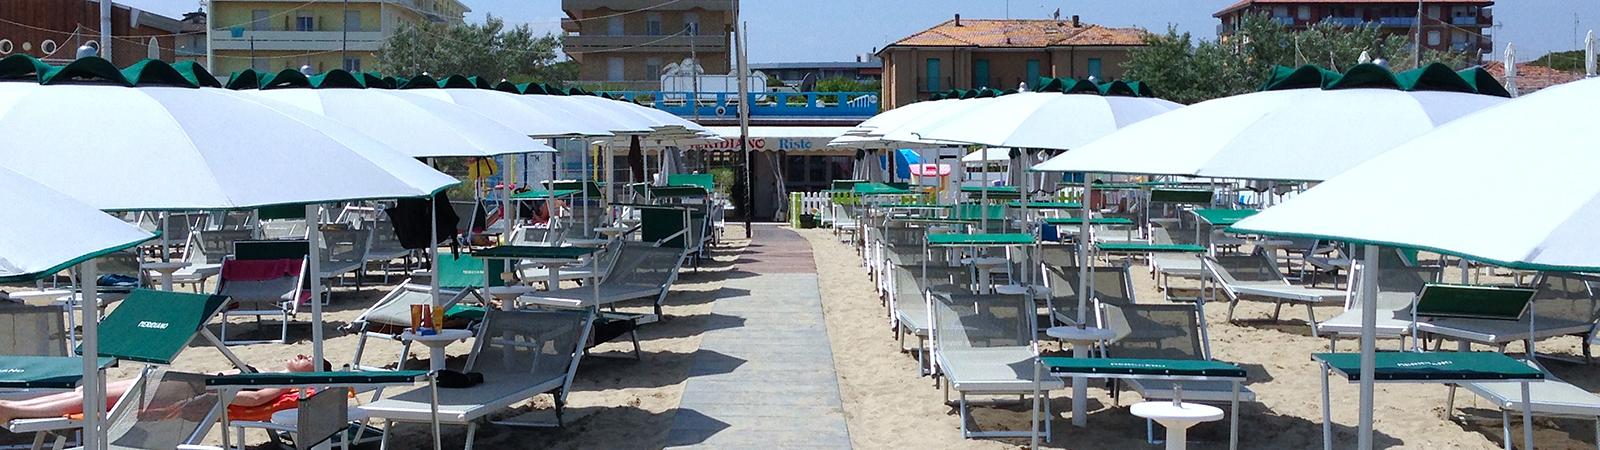 Bagno Meridiano 34